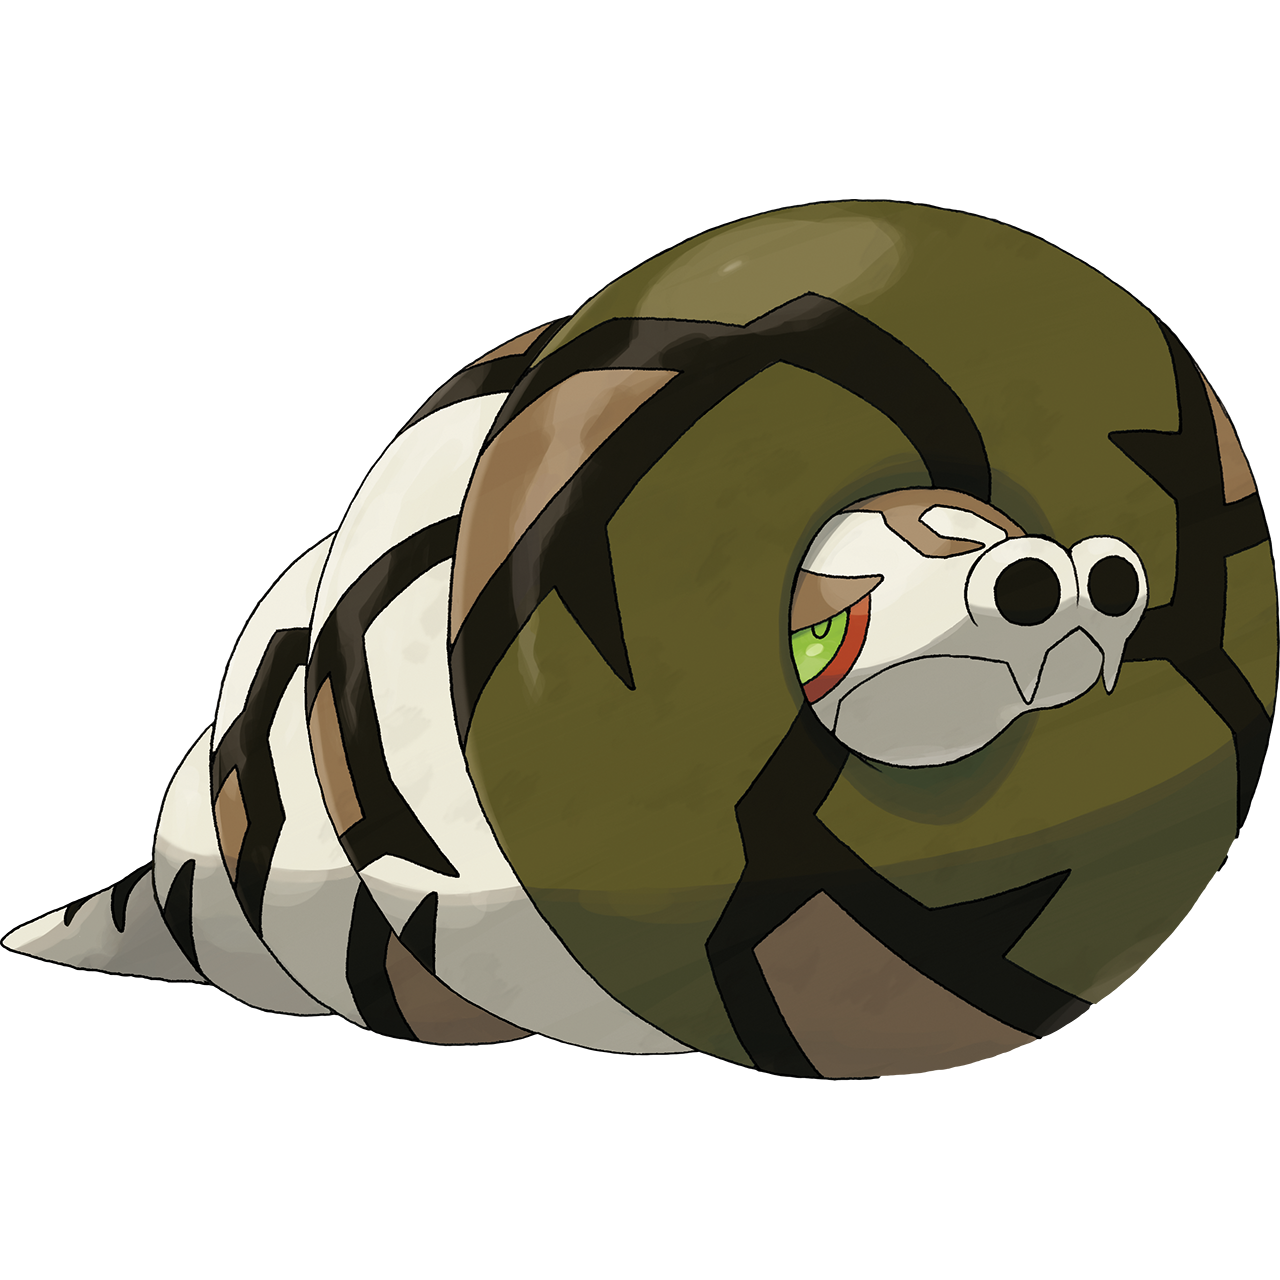 Sandaconda (Pokémon)